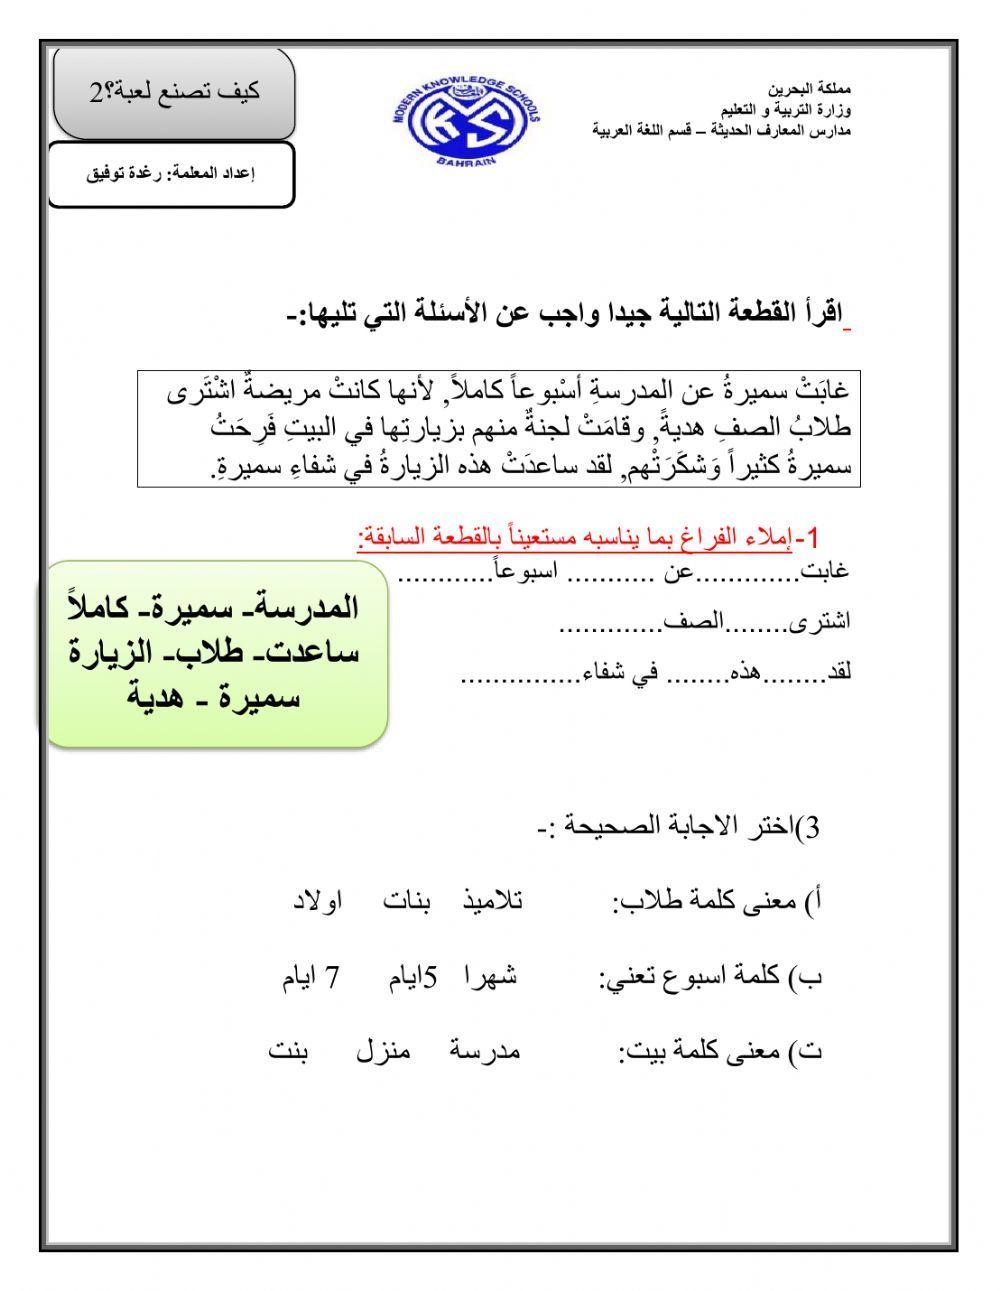 فهم المقروء Online Worksheet For ٢ You Can Do The Exercises Online Or Download The Worksheet As Pdf Learn Arabic Alphabet Arabic Worksheets Learning Arabic